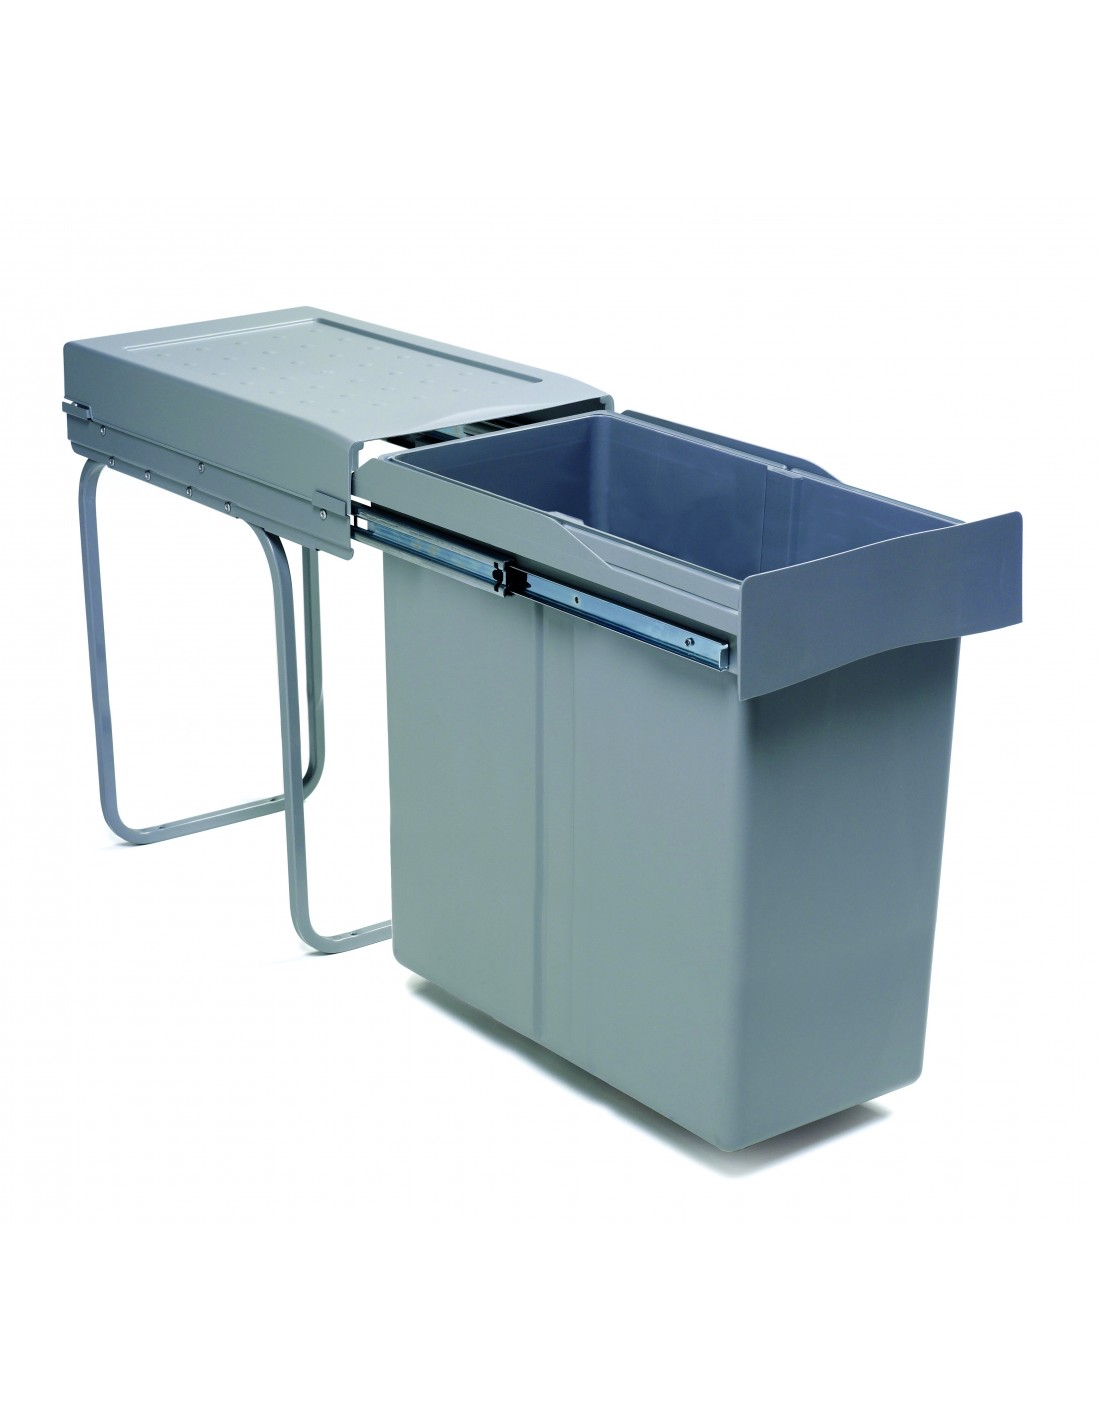 Kitchen Waste Bins #18: Romagna Single Container Kitchen Waste Bin 300mm 40L Pull Out Unit